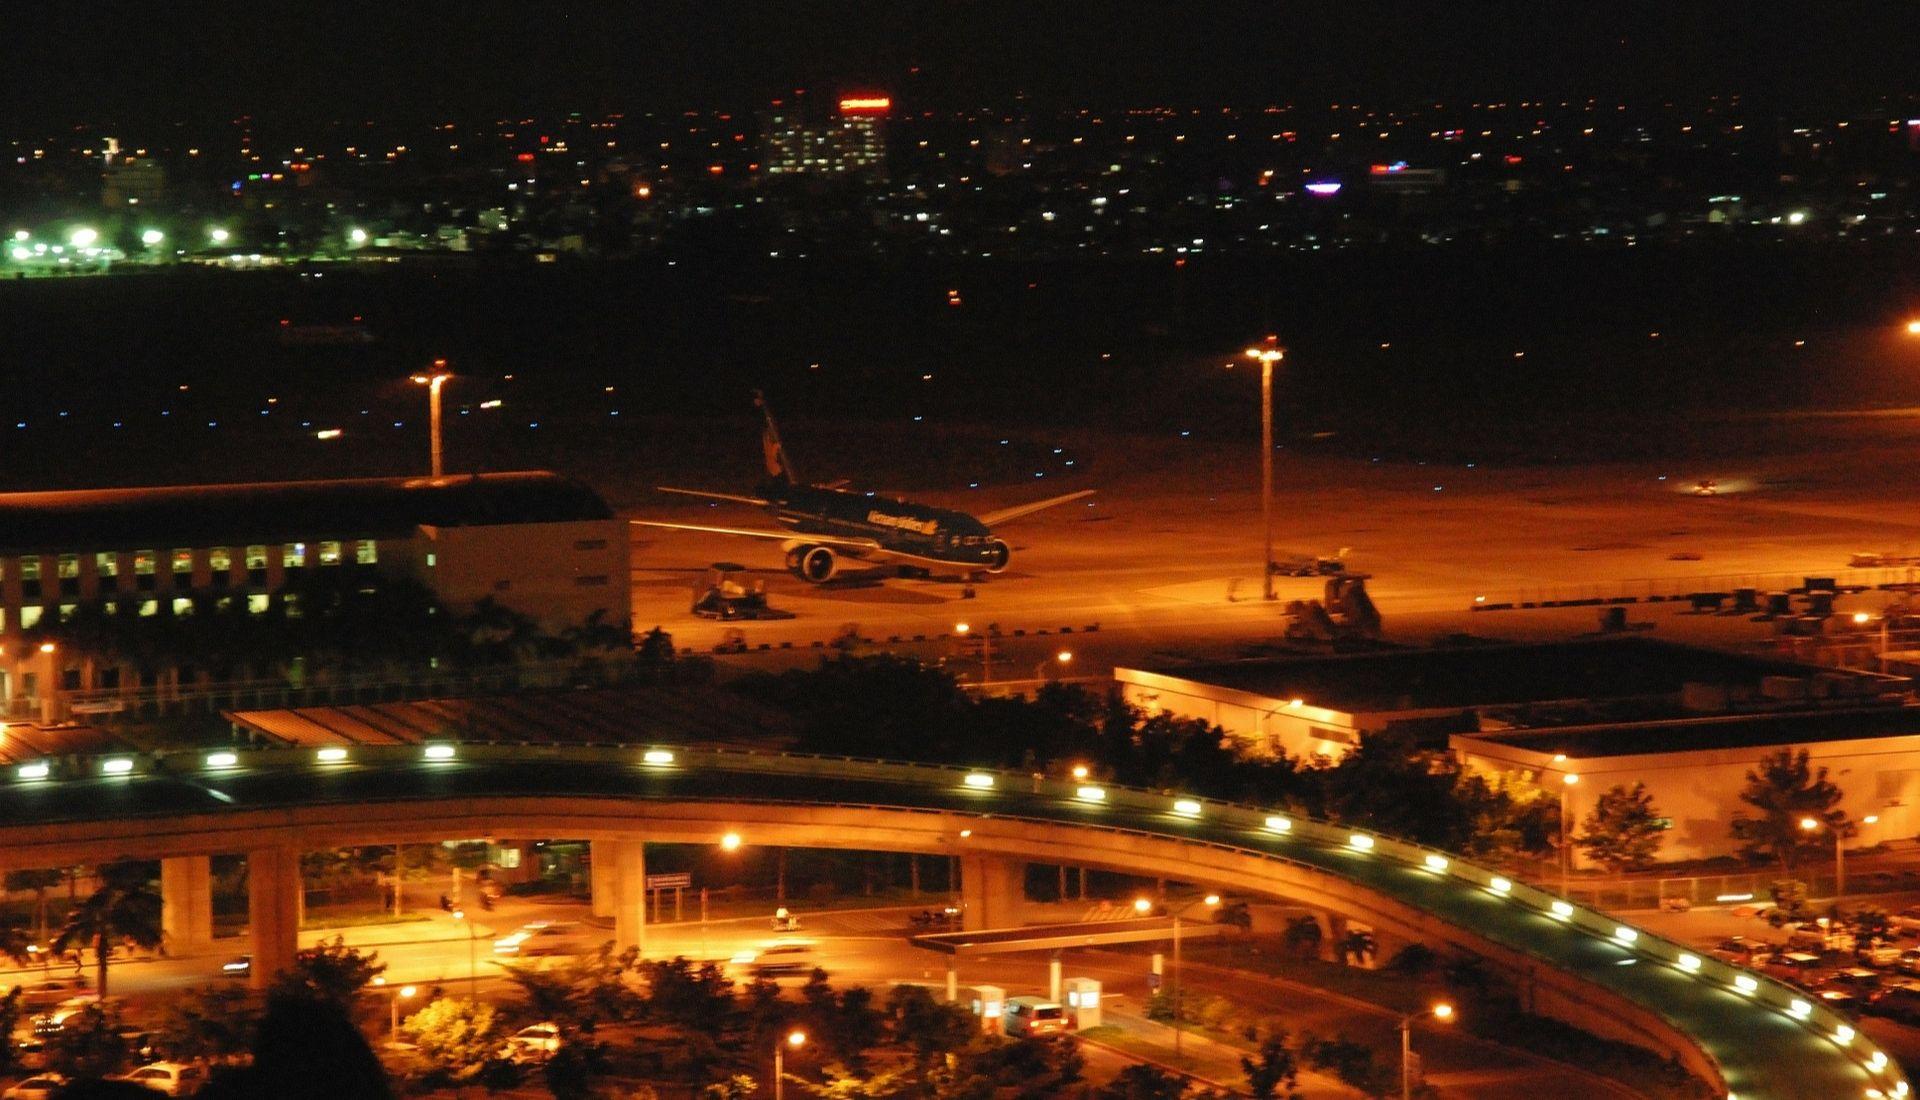 Saigon Airport at Night